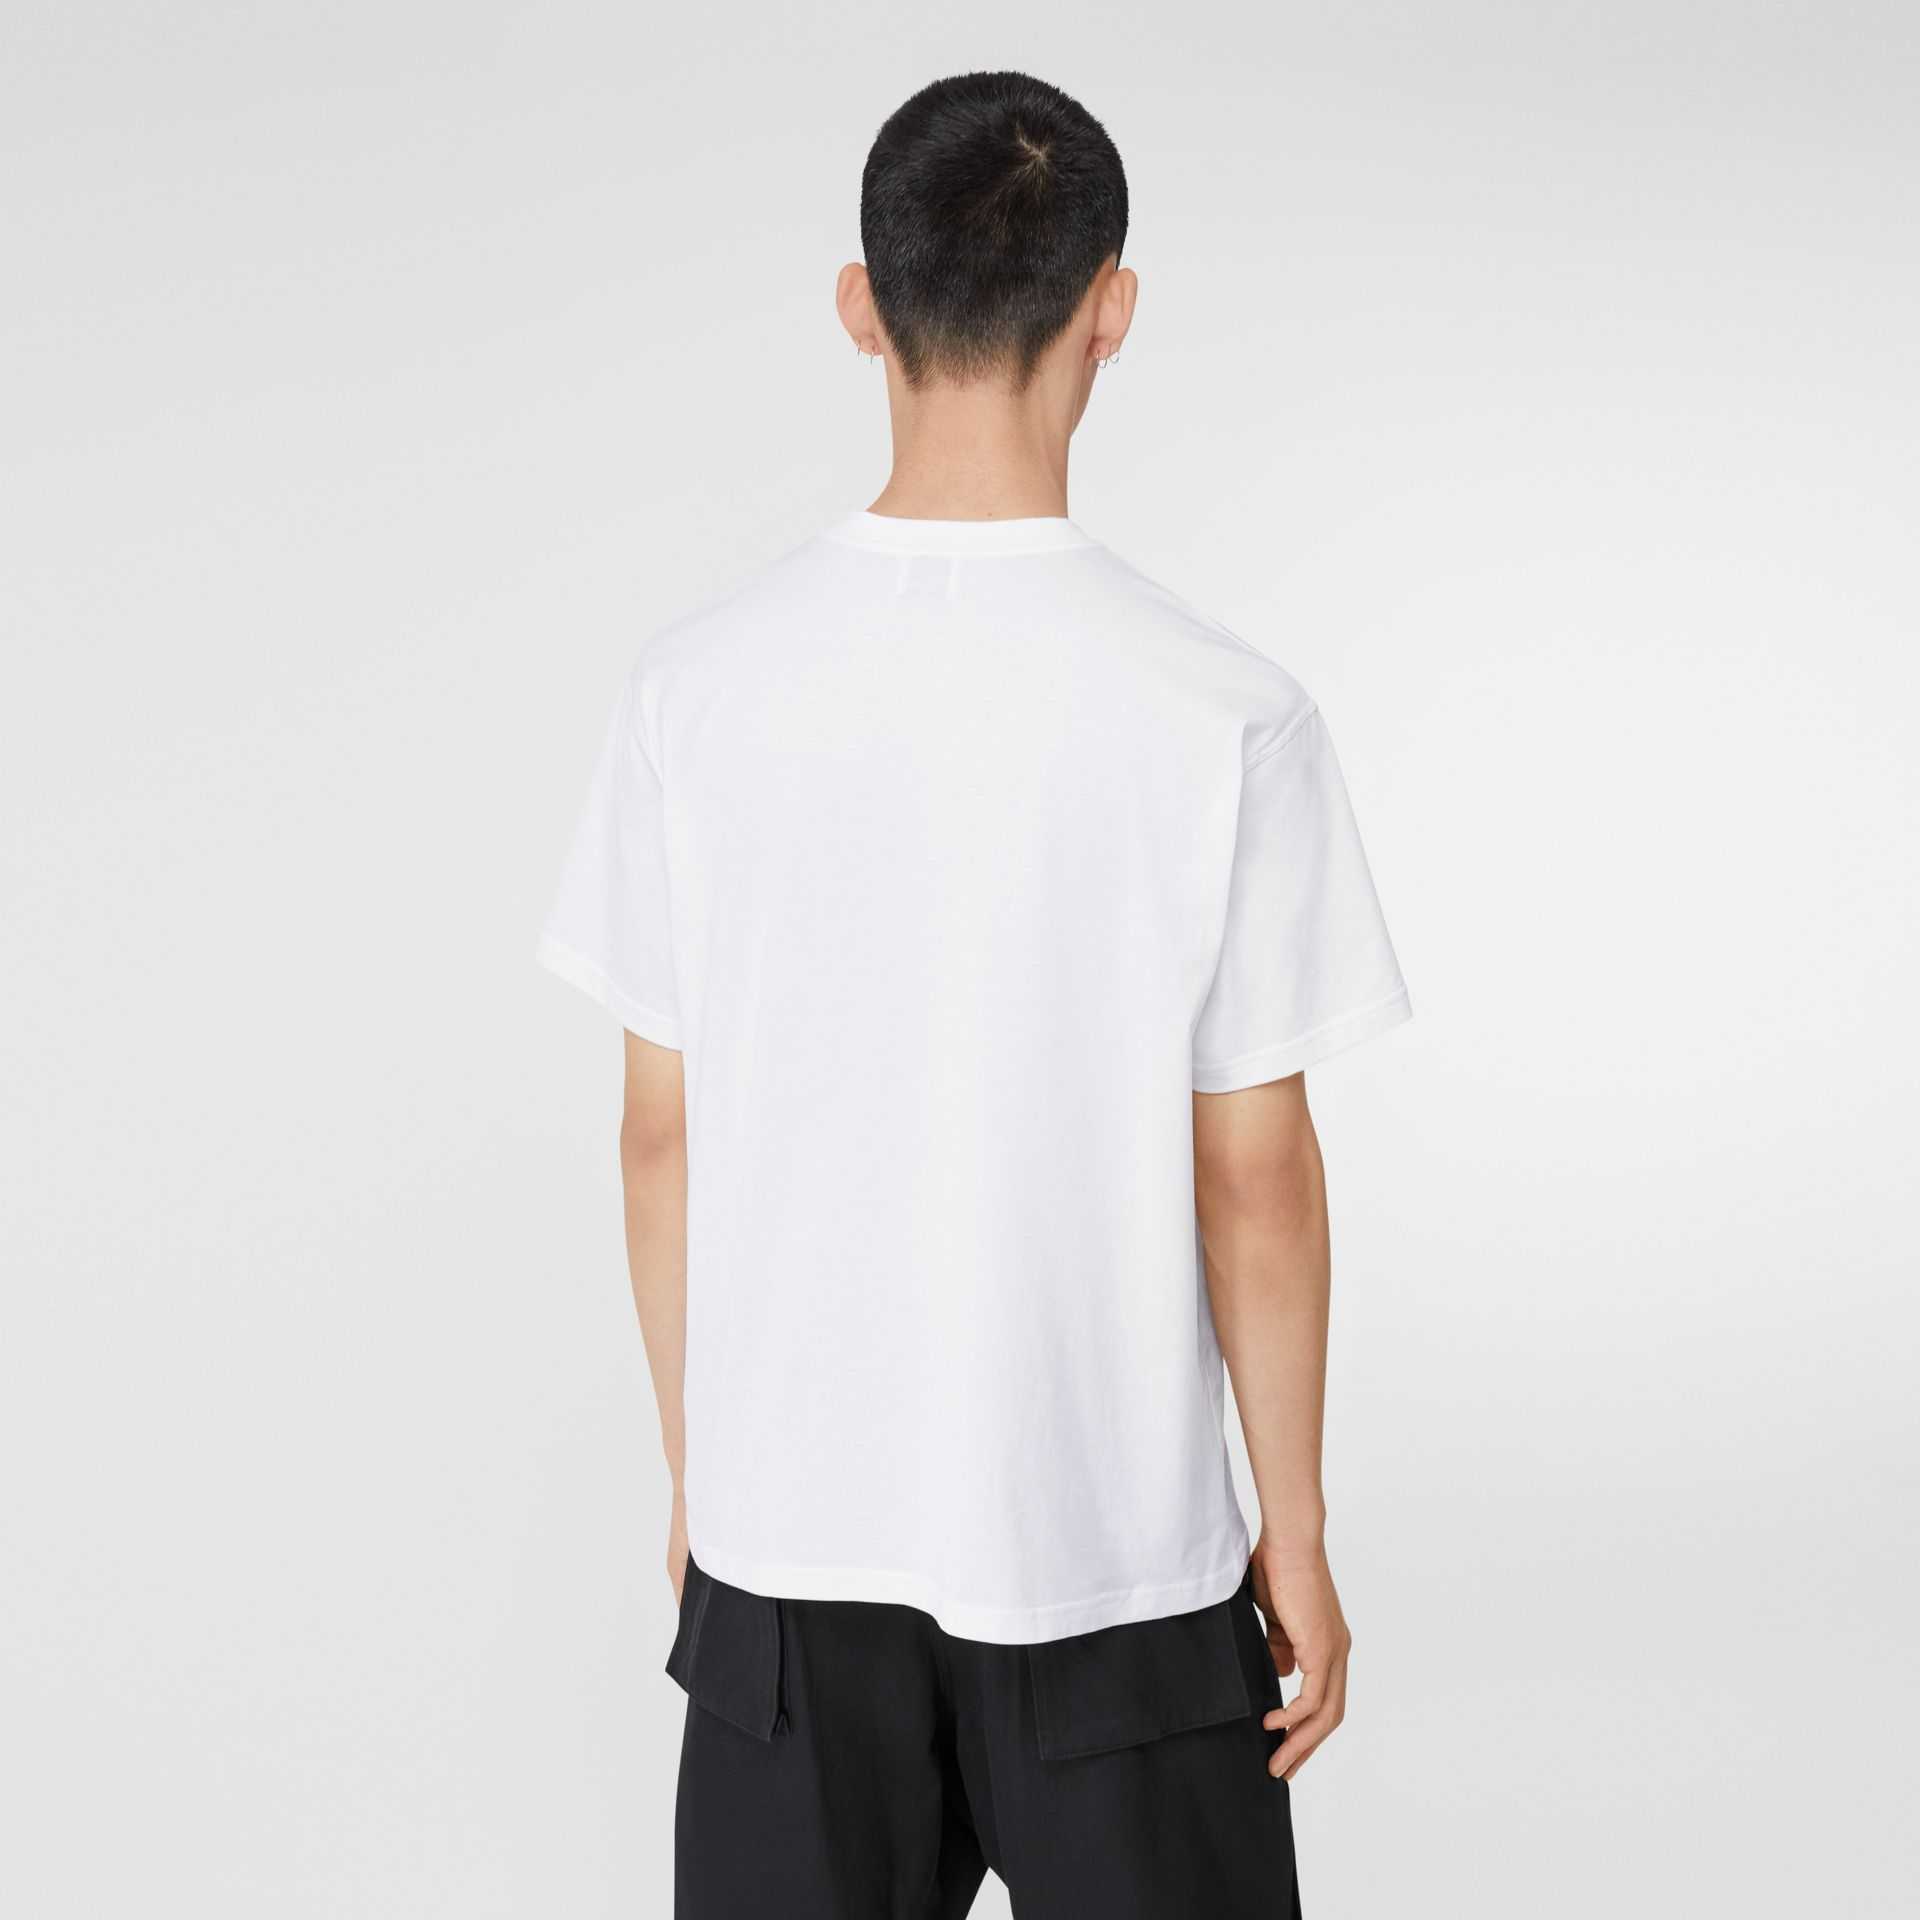 Monogram Motif Cotton Oversized T-shirt in White - Men | Burberry - gallery image 2